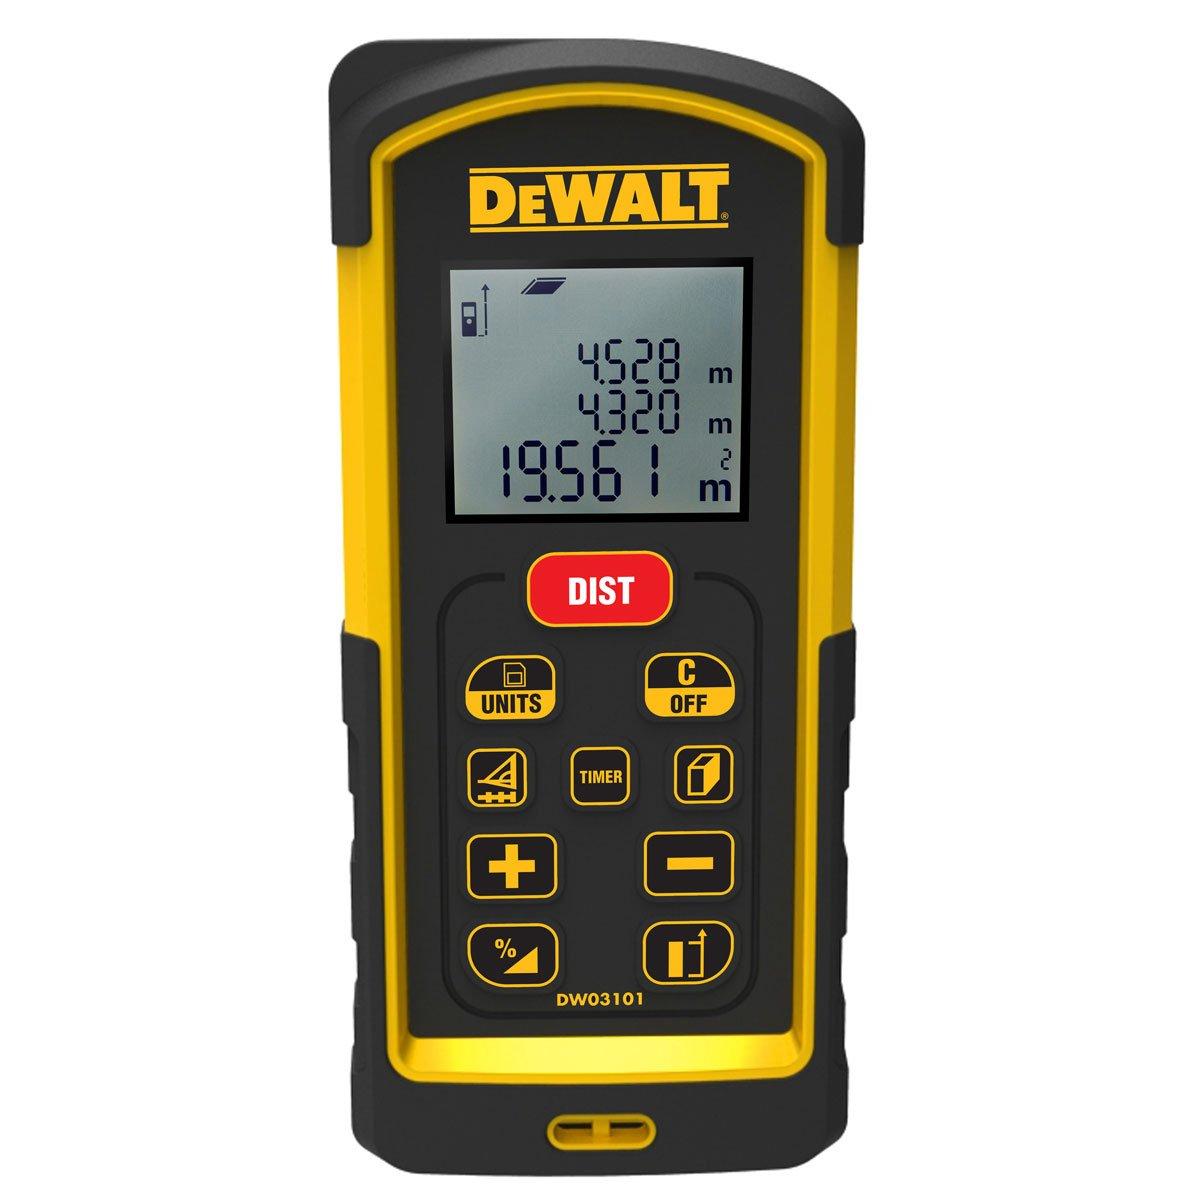 DeWALT DW03101 laserový dálkoměr 100m